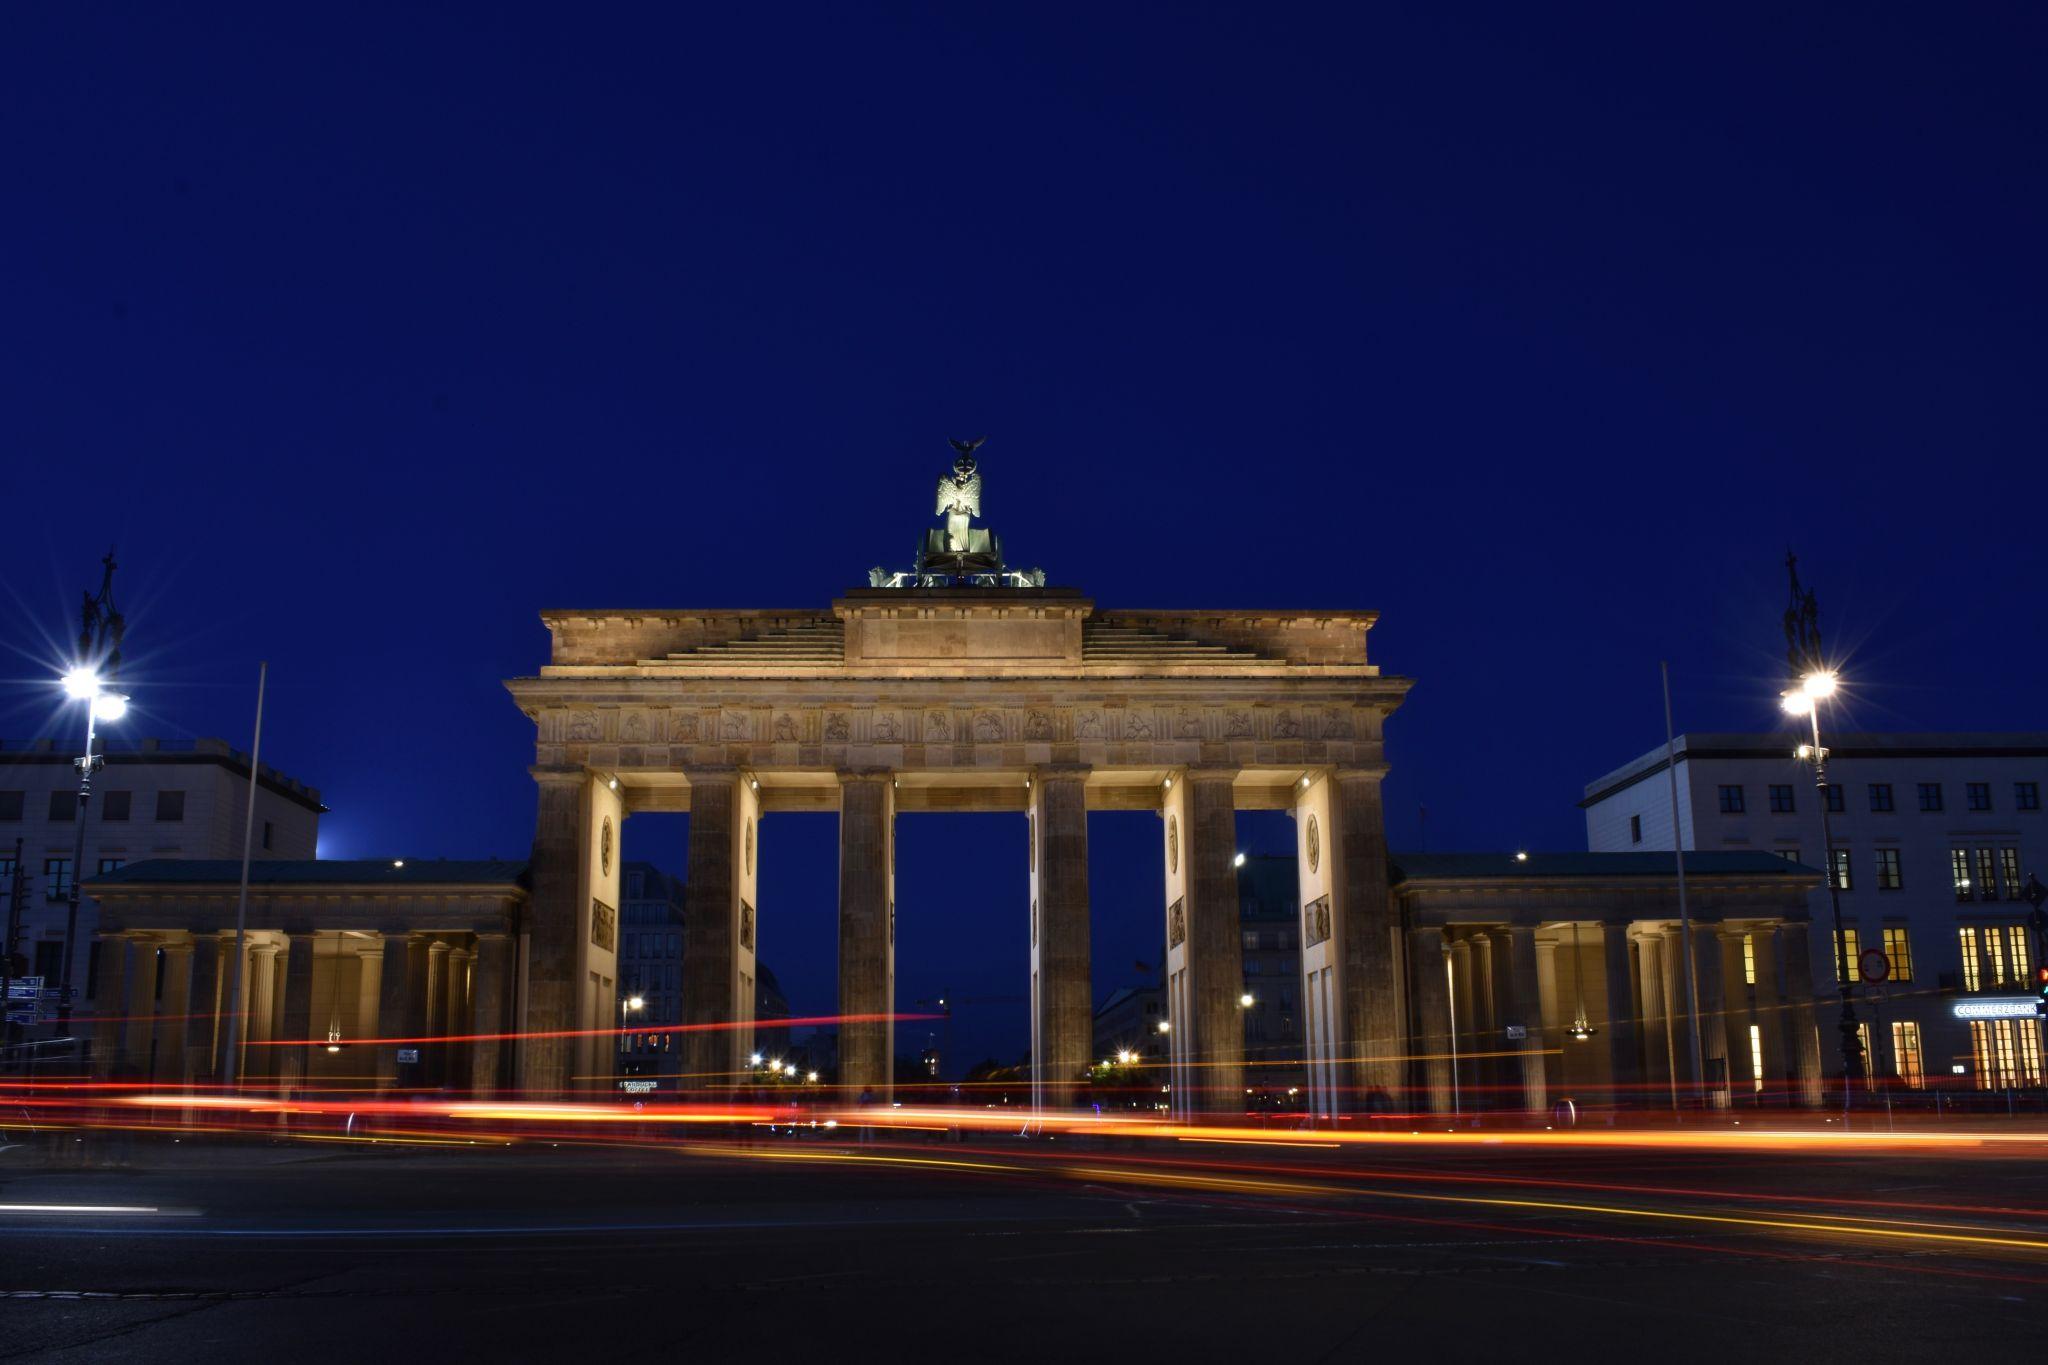 Brandenburger Tor, Germany